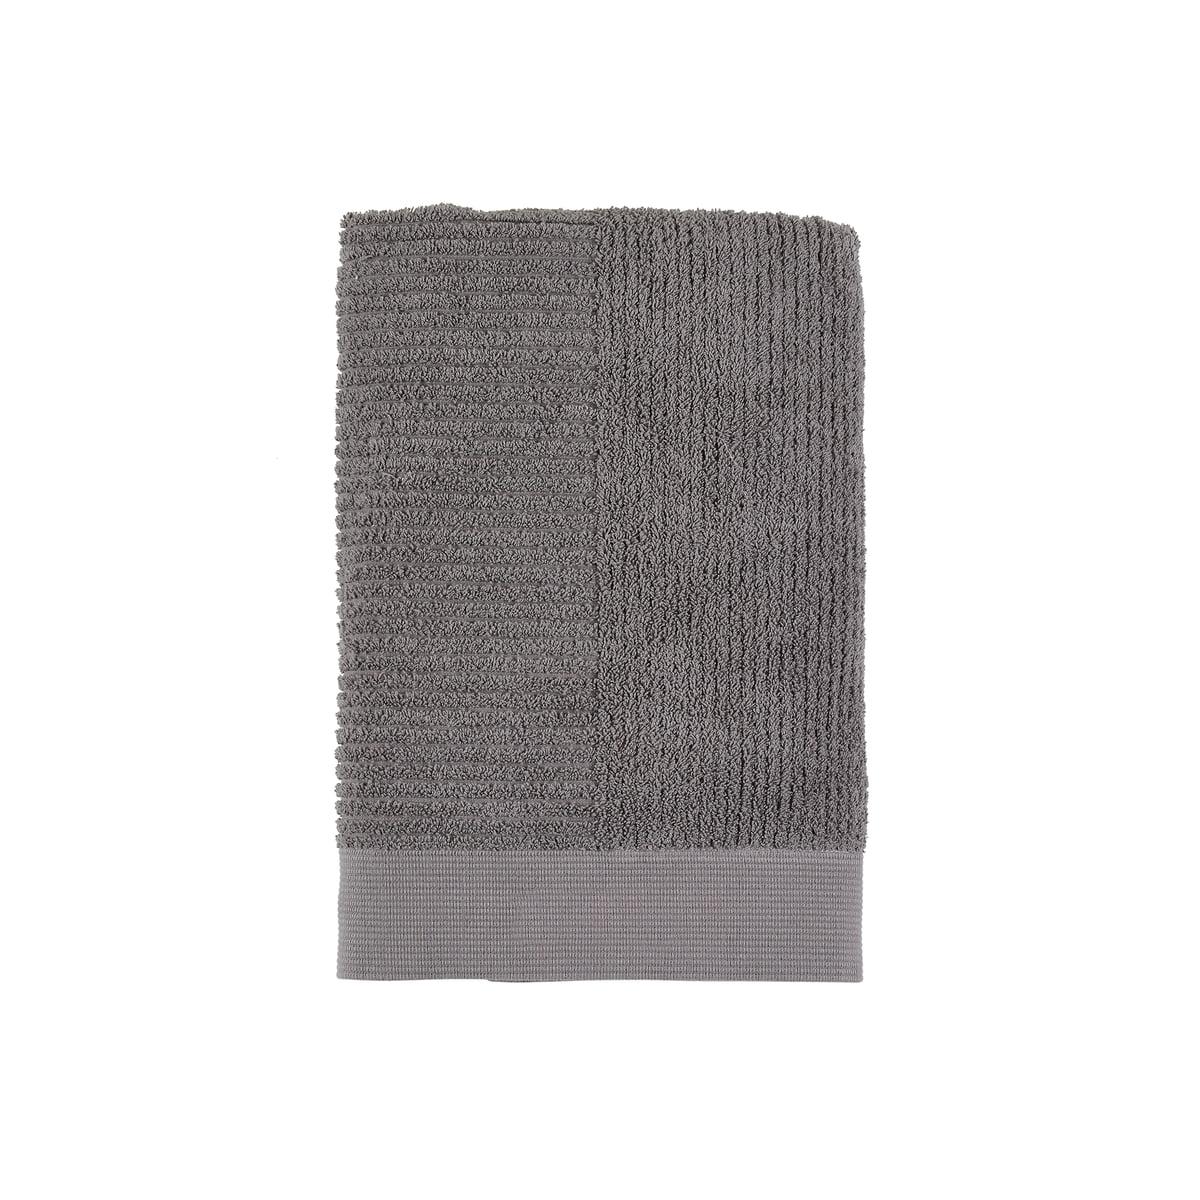 Zone Denmark - Classic Gästehandtuch, 50 x 70 cm, grau | Bad > Handtücher > Gästehandtücher | Dunkelgrau | Baumwolle | Zone Denmark